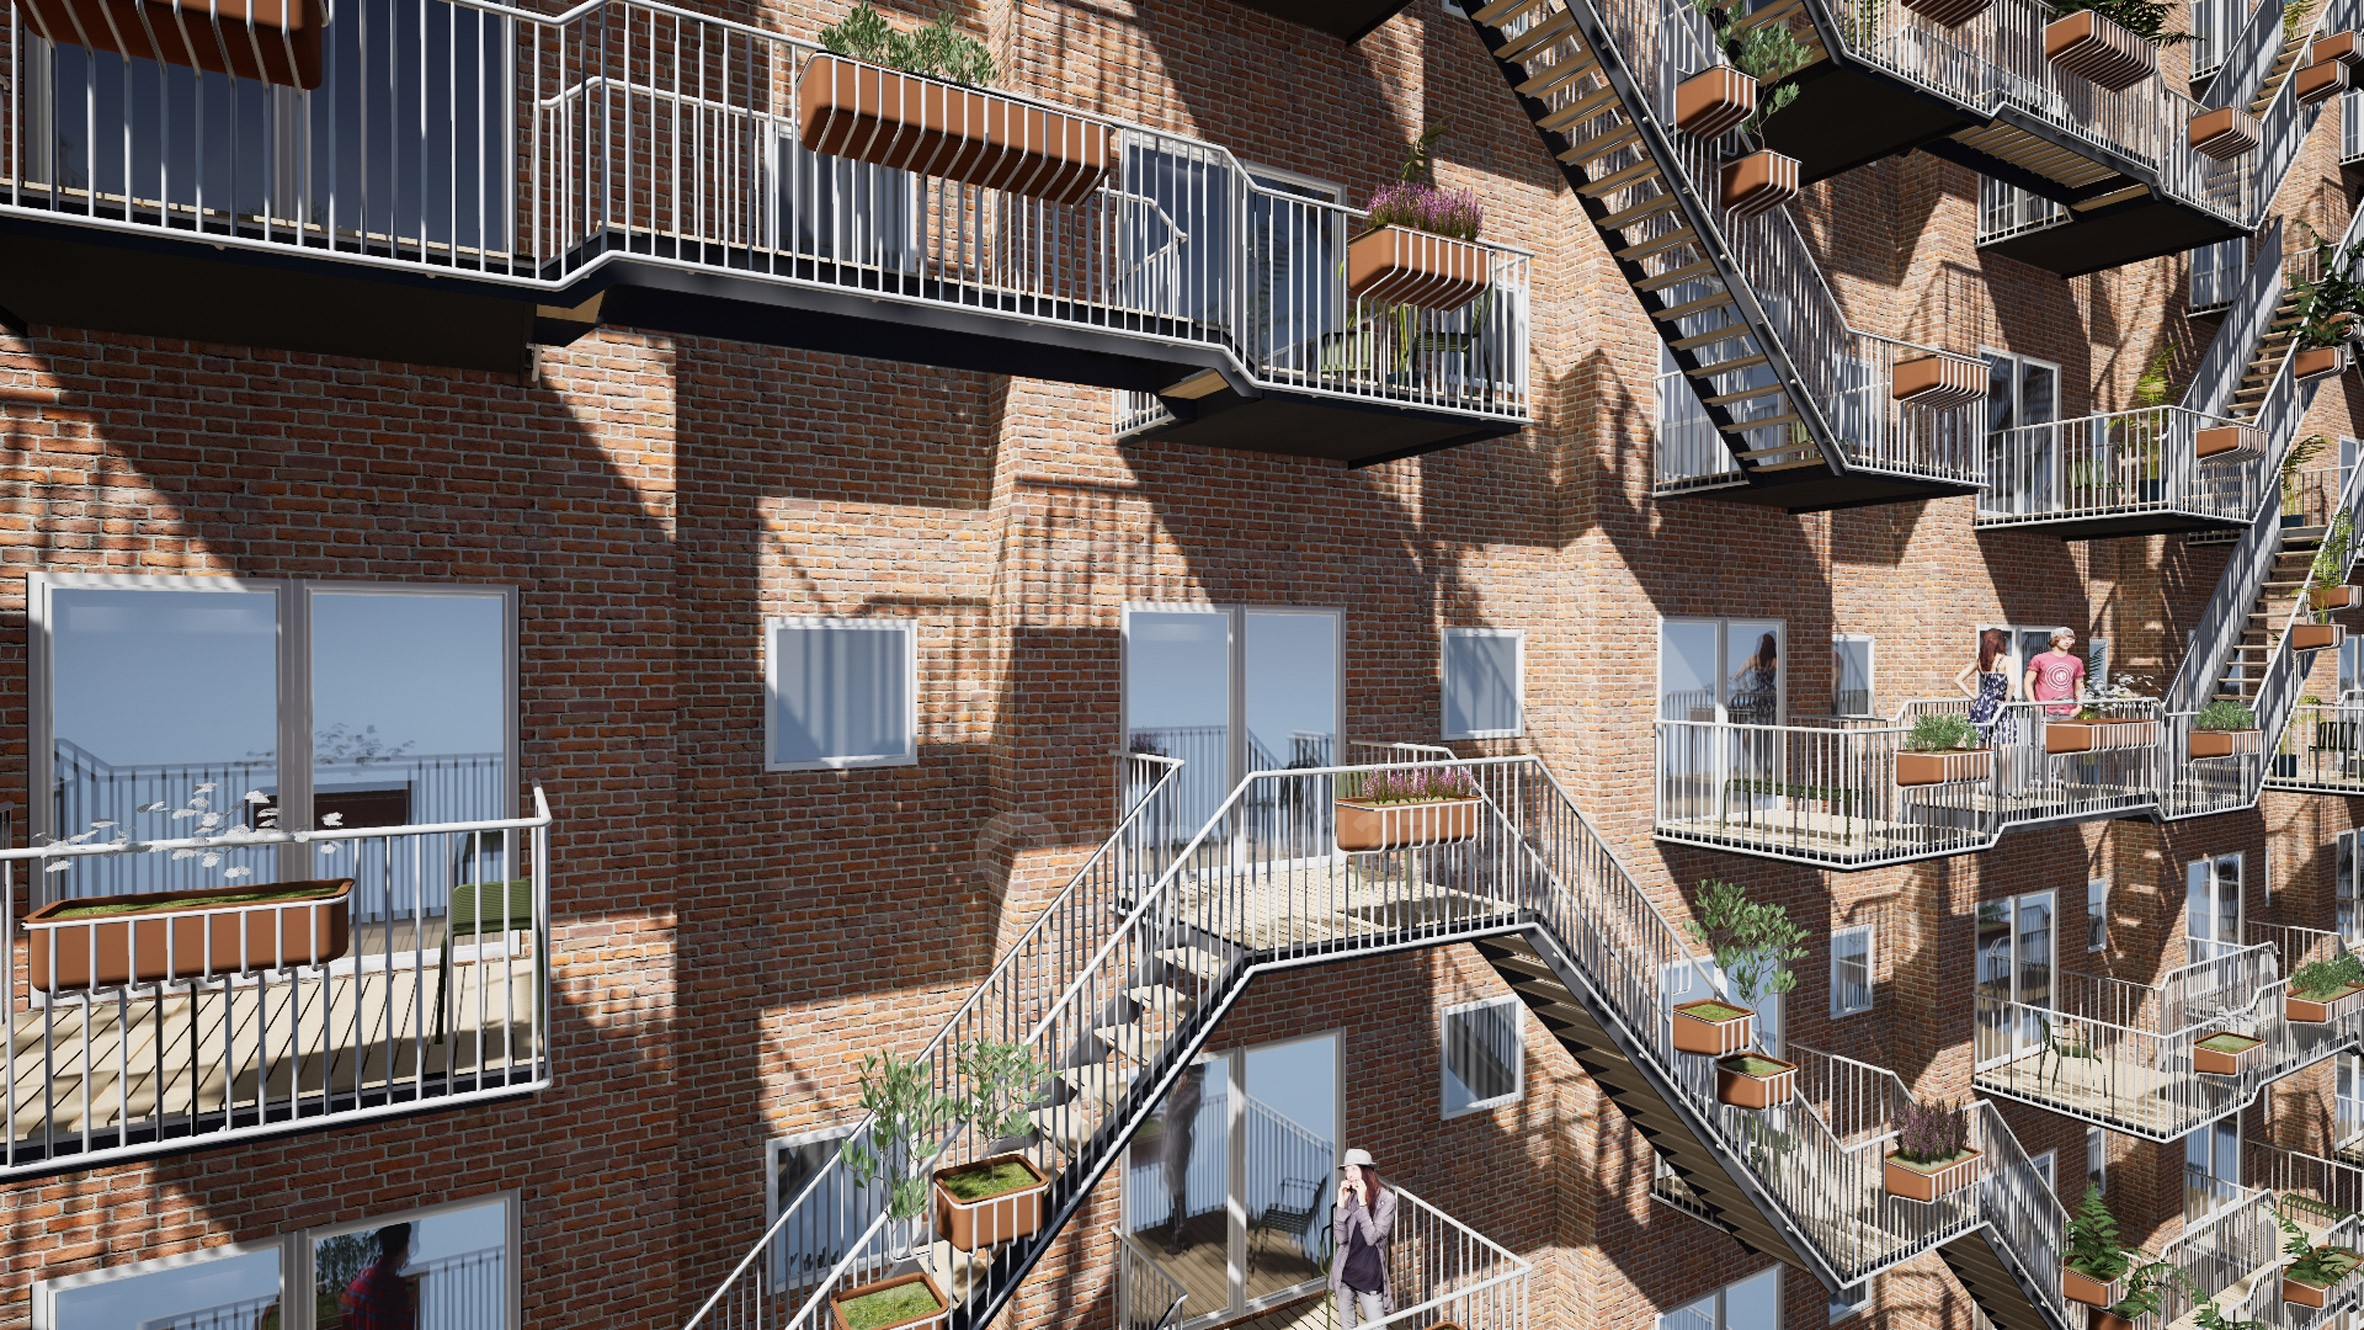 Balkon Tuh Tempat Tempat Bergaul sama Tetangga, Bukan Tempat Jemuran